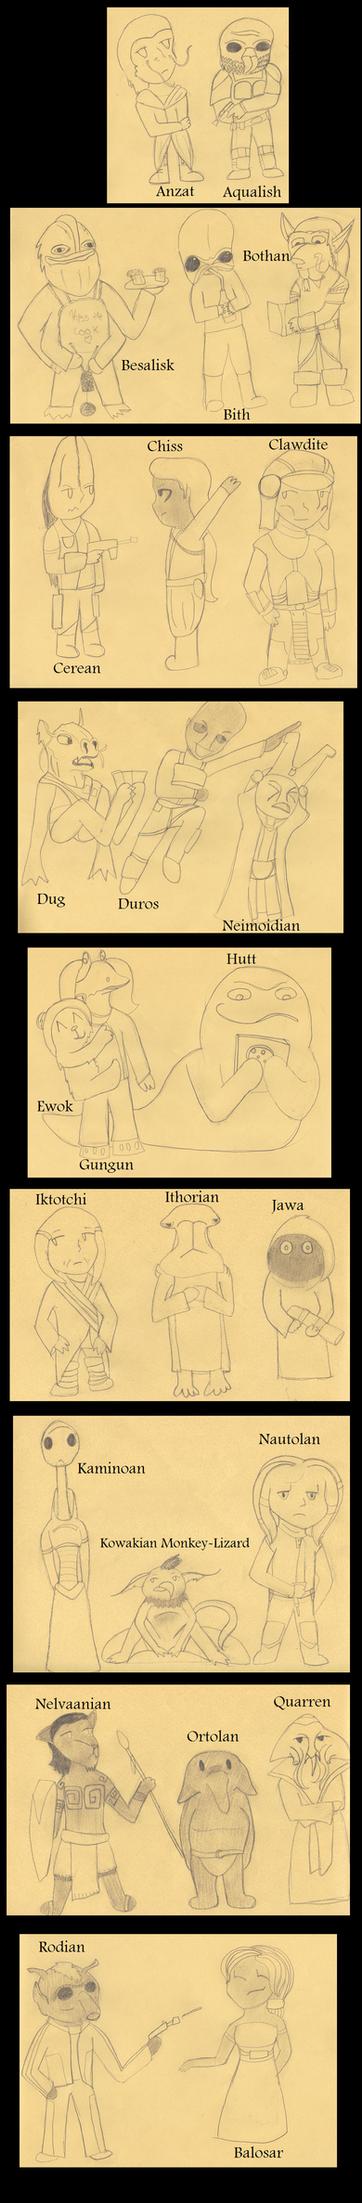 Epic Star Wars Species Challenge by ElyssaJM